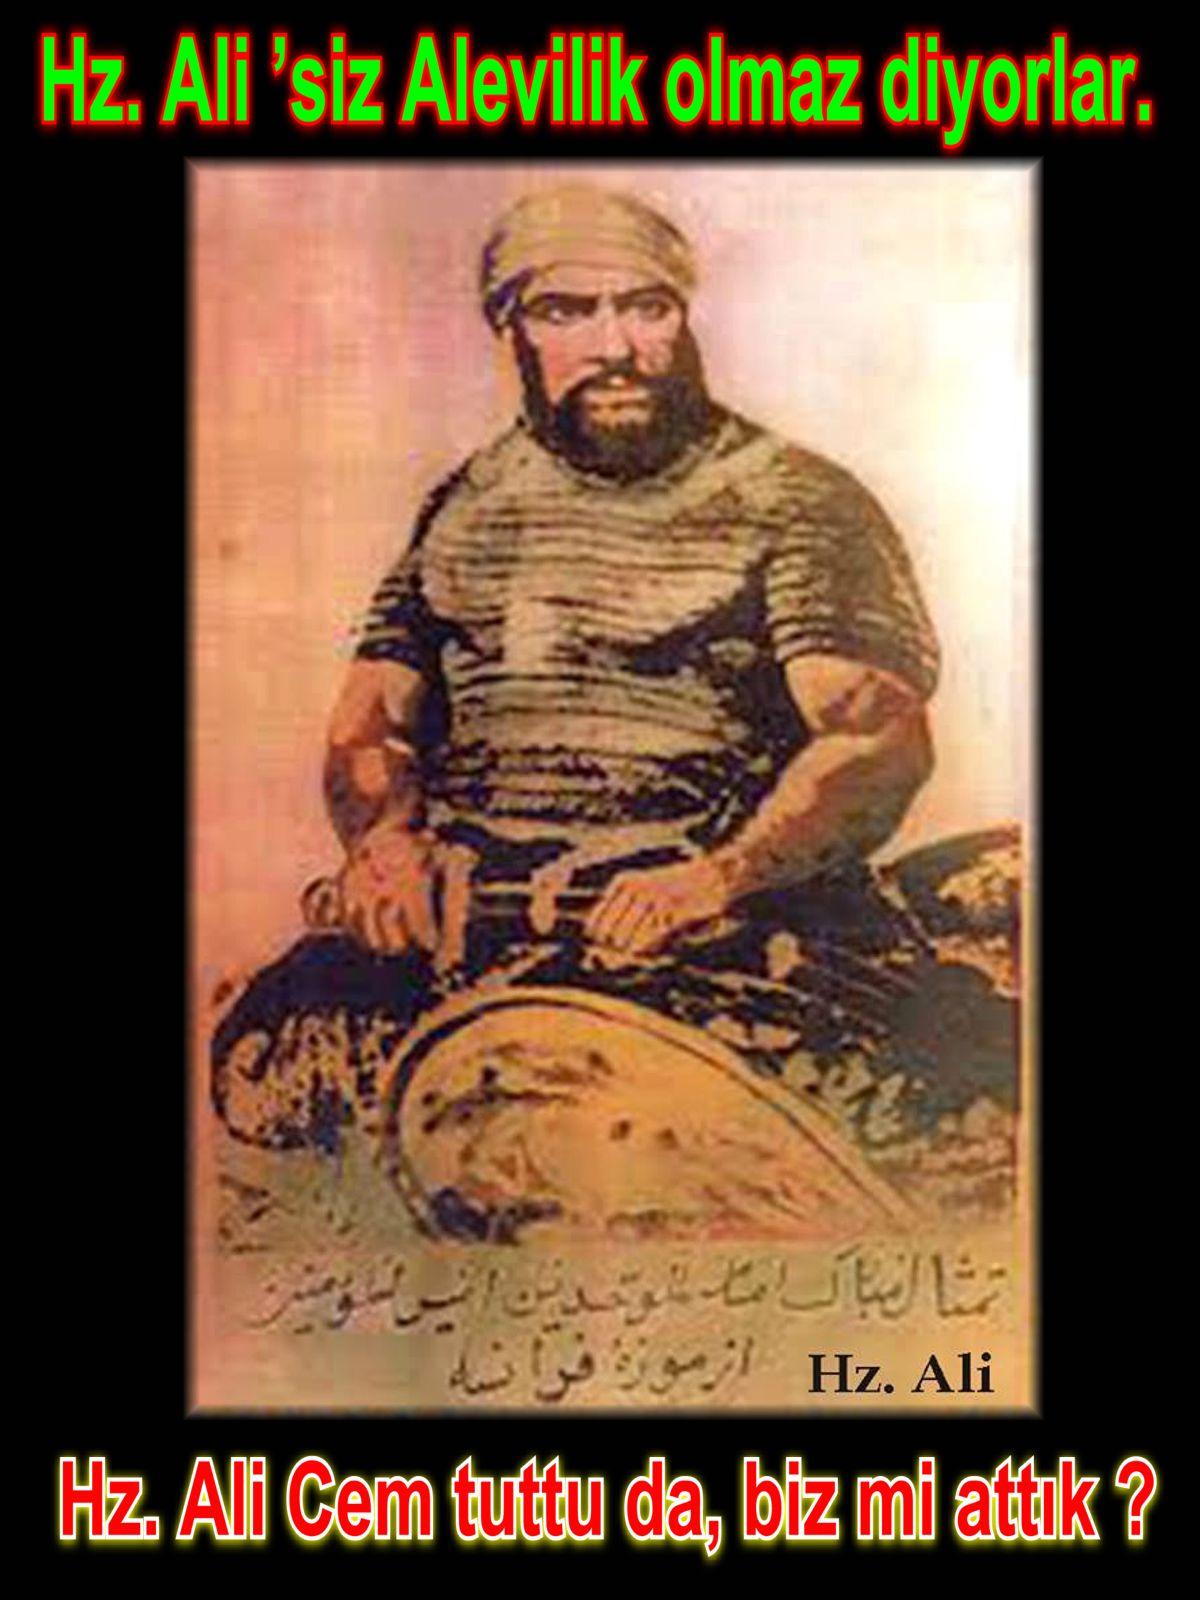 12 Hz imam Ali divani Alevi bektasi kizilbas pir sultan cemevi cem semah devrimci aleviler birligi DAB Feramuz Sah Acar hz arap ali cem mi tuttu da biz attik